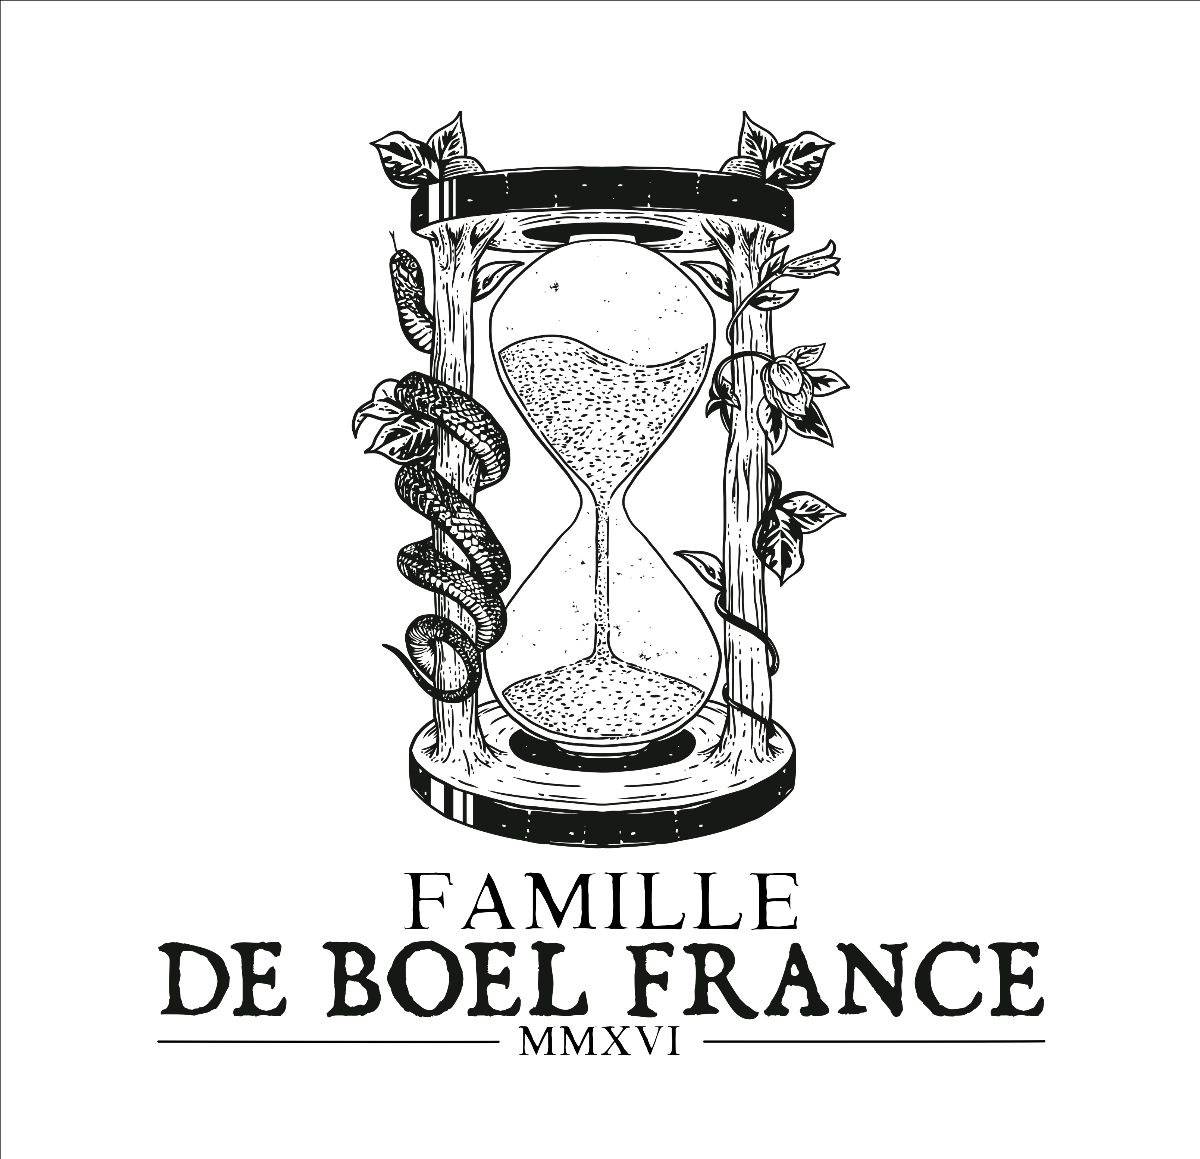 de boel France